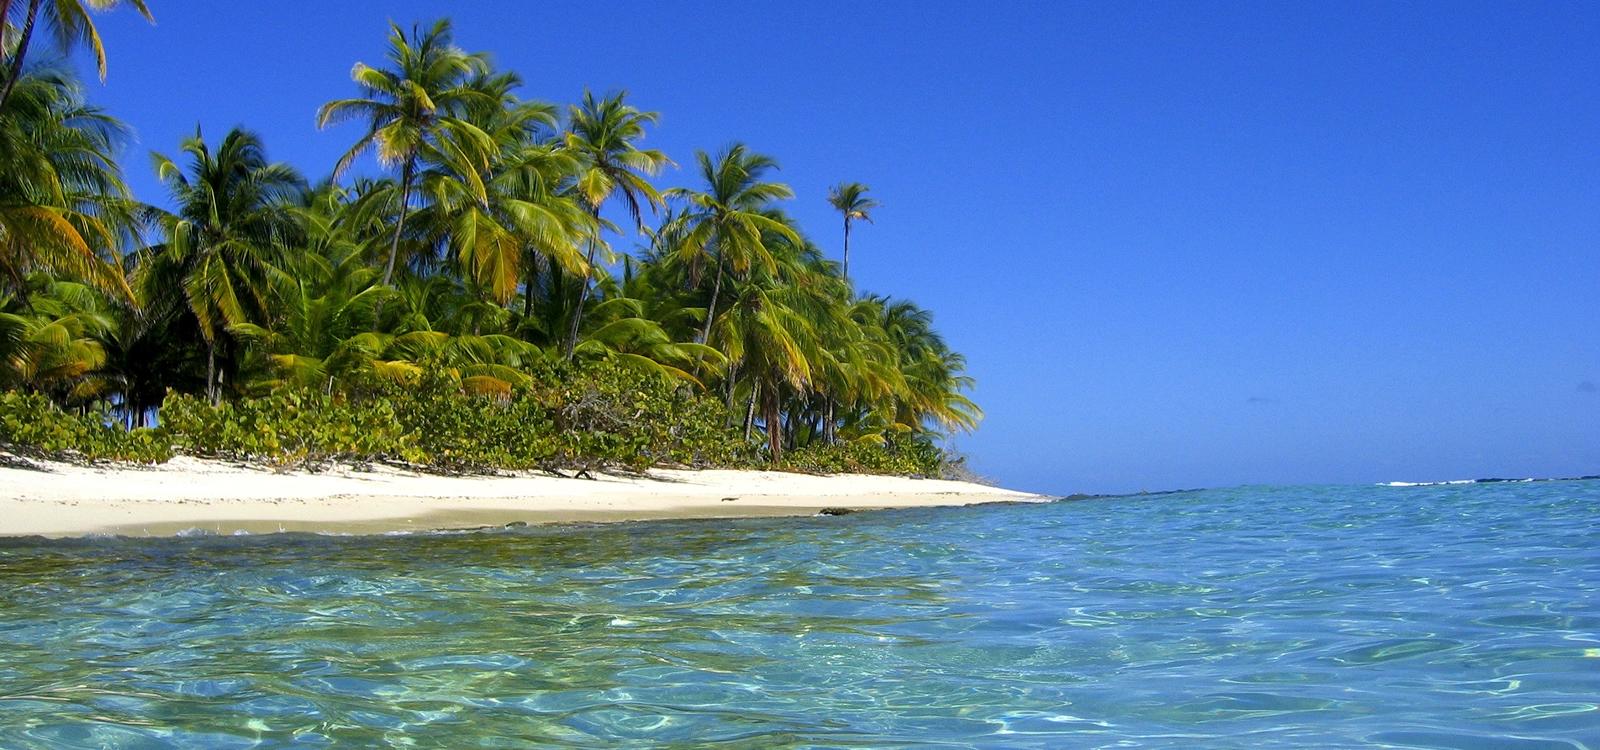 20 Acre Private Island For Sale on Anguilla Real Estate Home For Sale